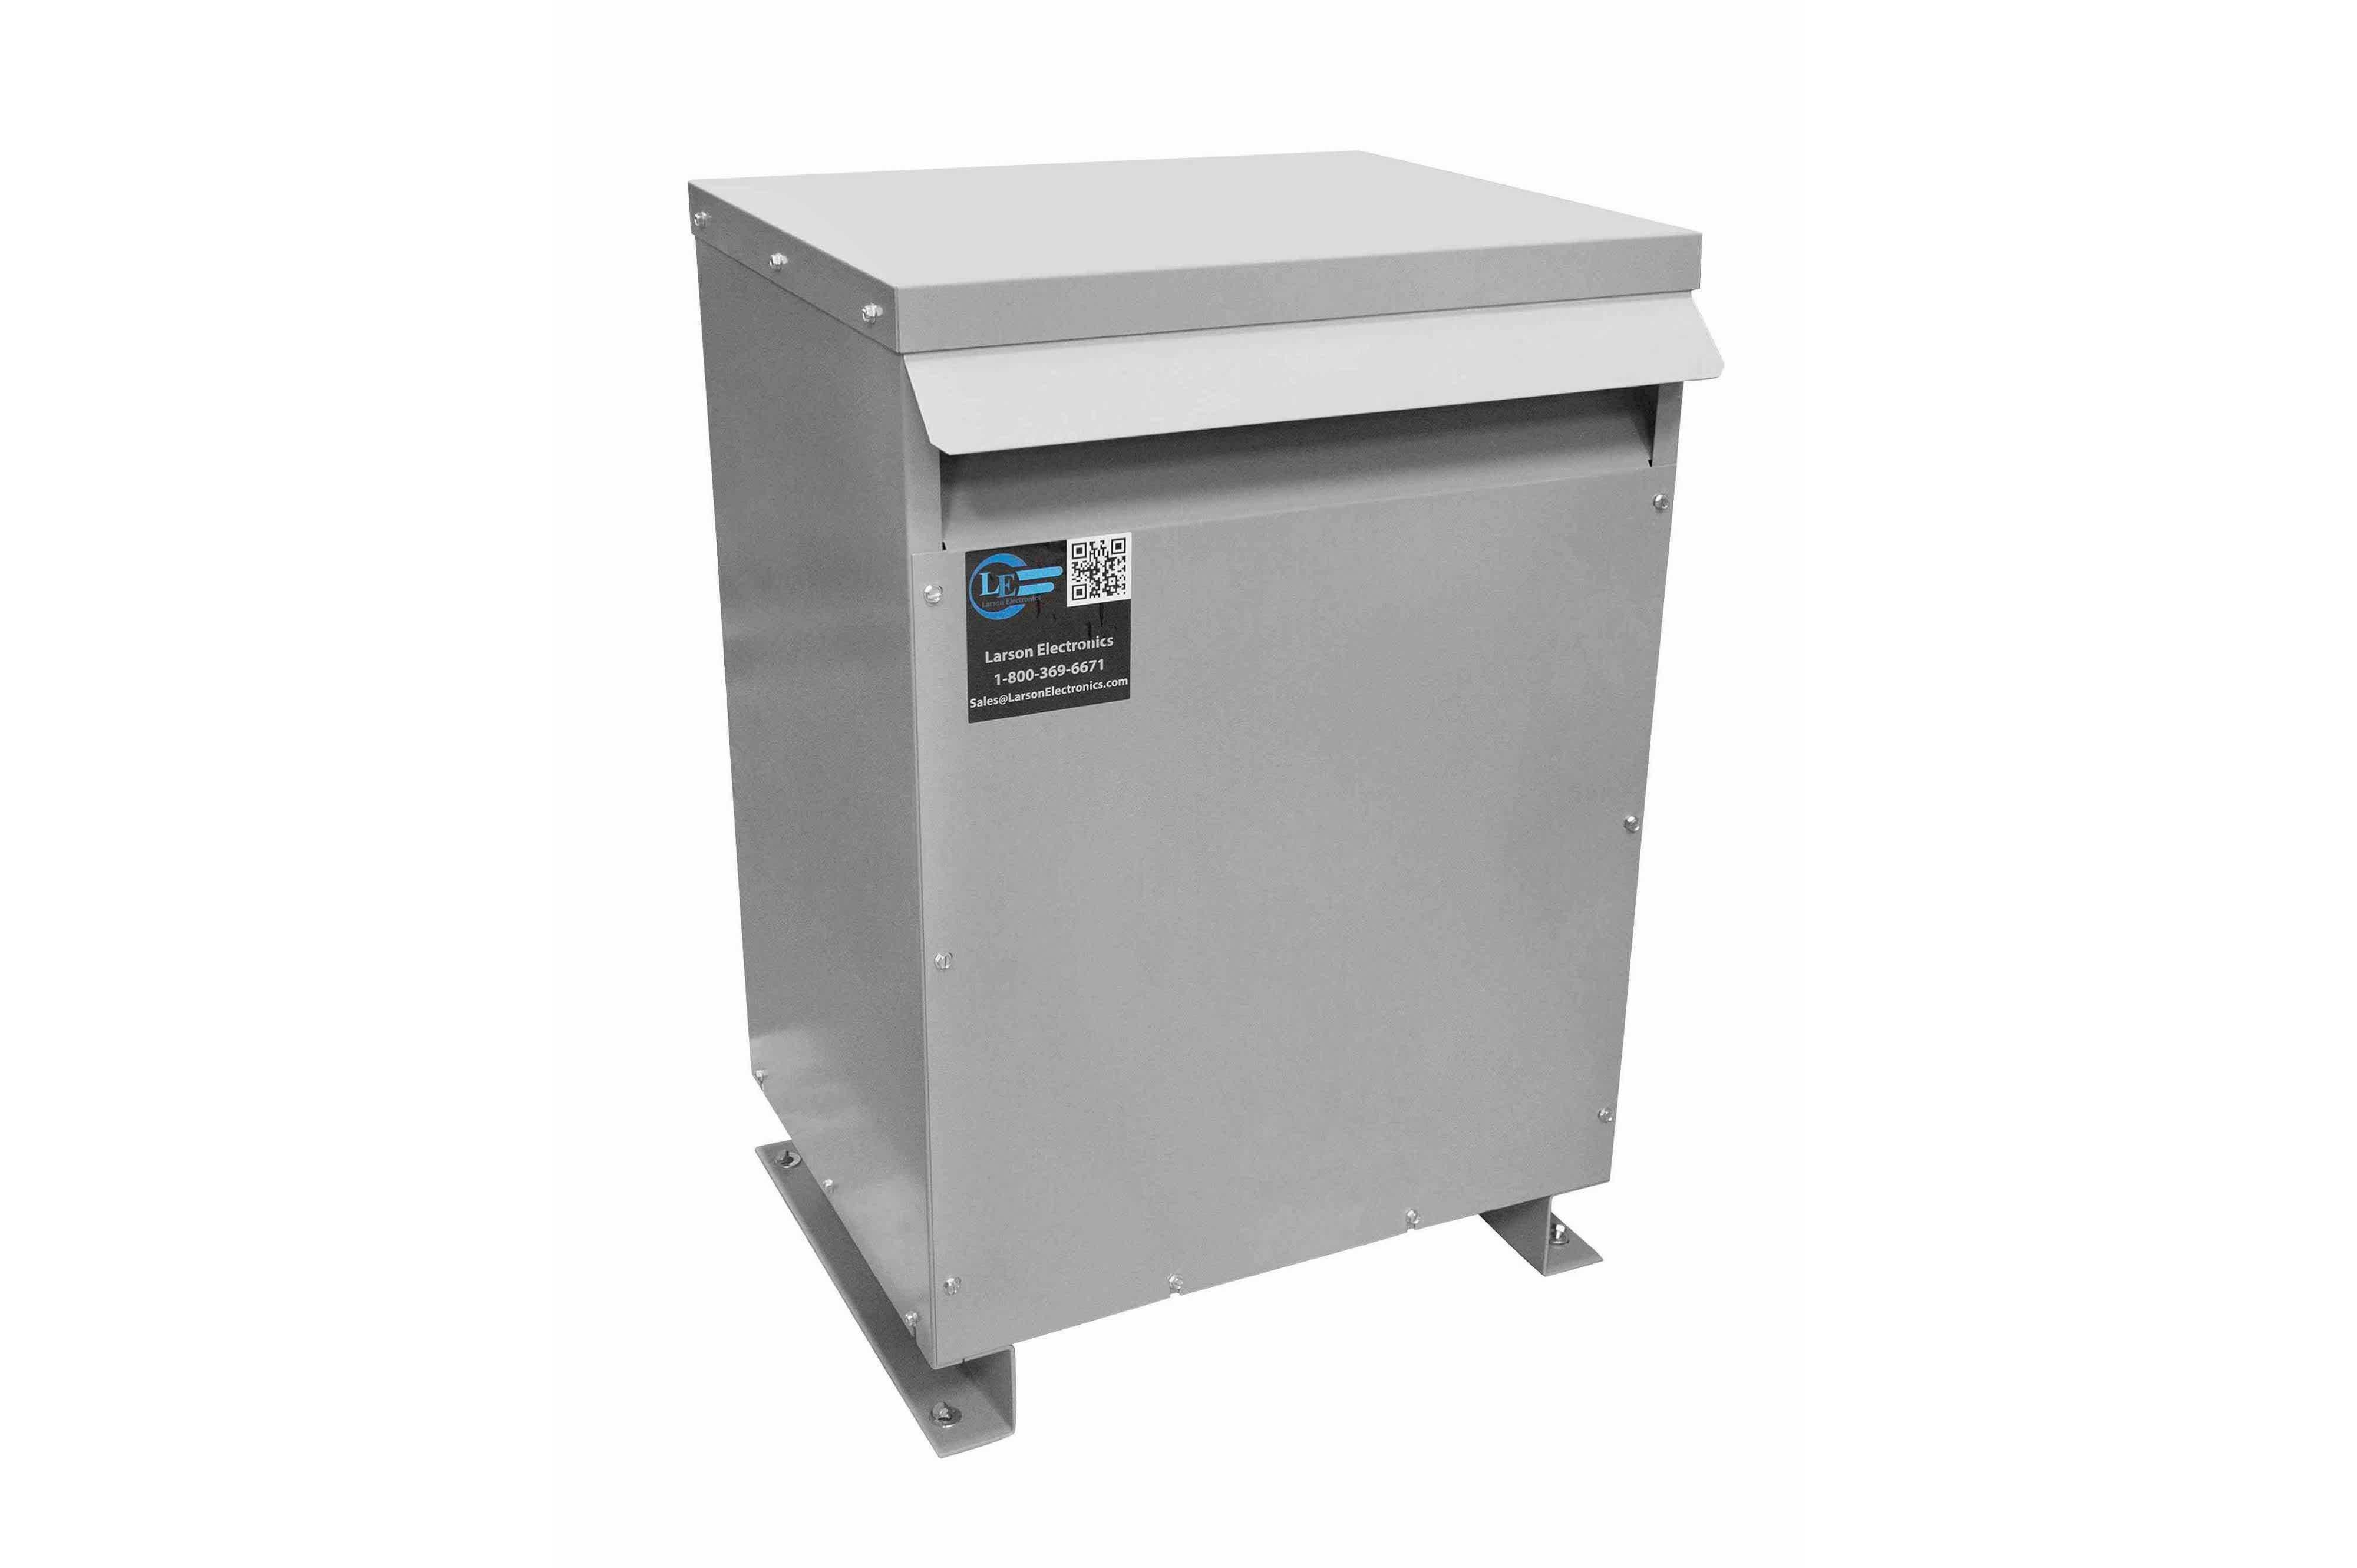 700 kVA 3PH Isolation Transformer, 400V Wye Primary, 480Y/277 Wye-N Secondary, N3R, Ventilated, 60 Hz